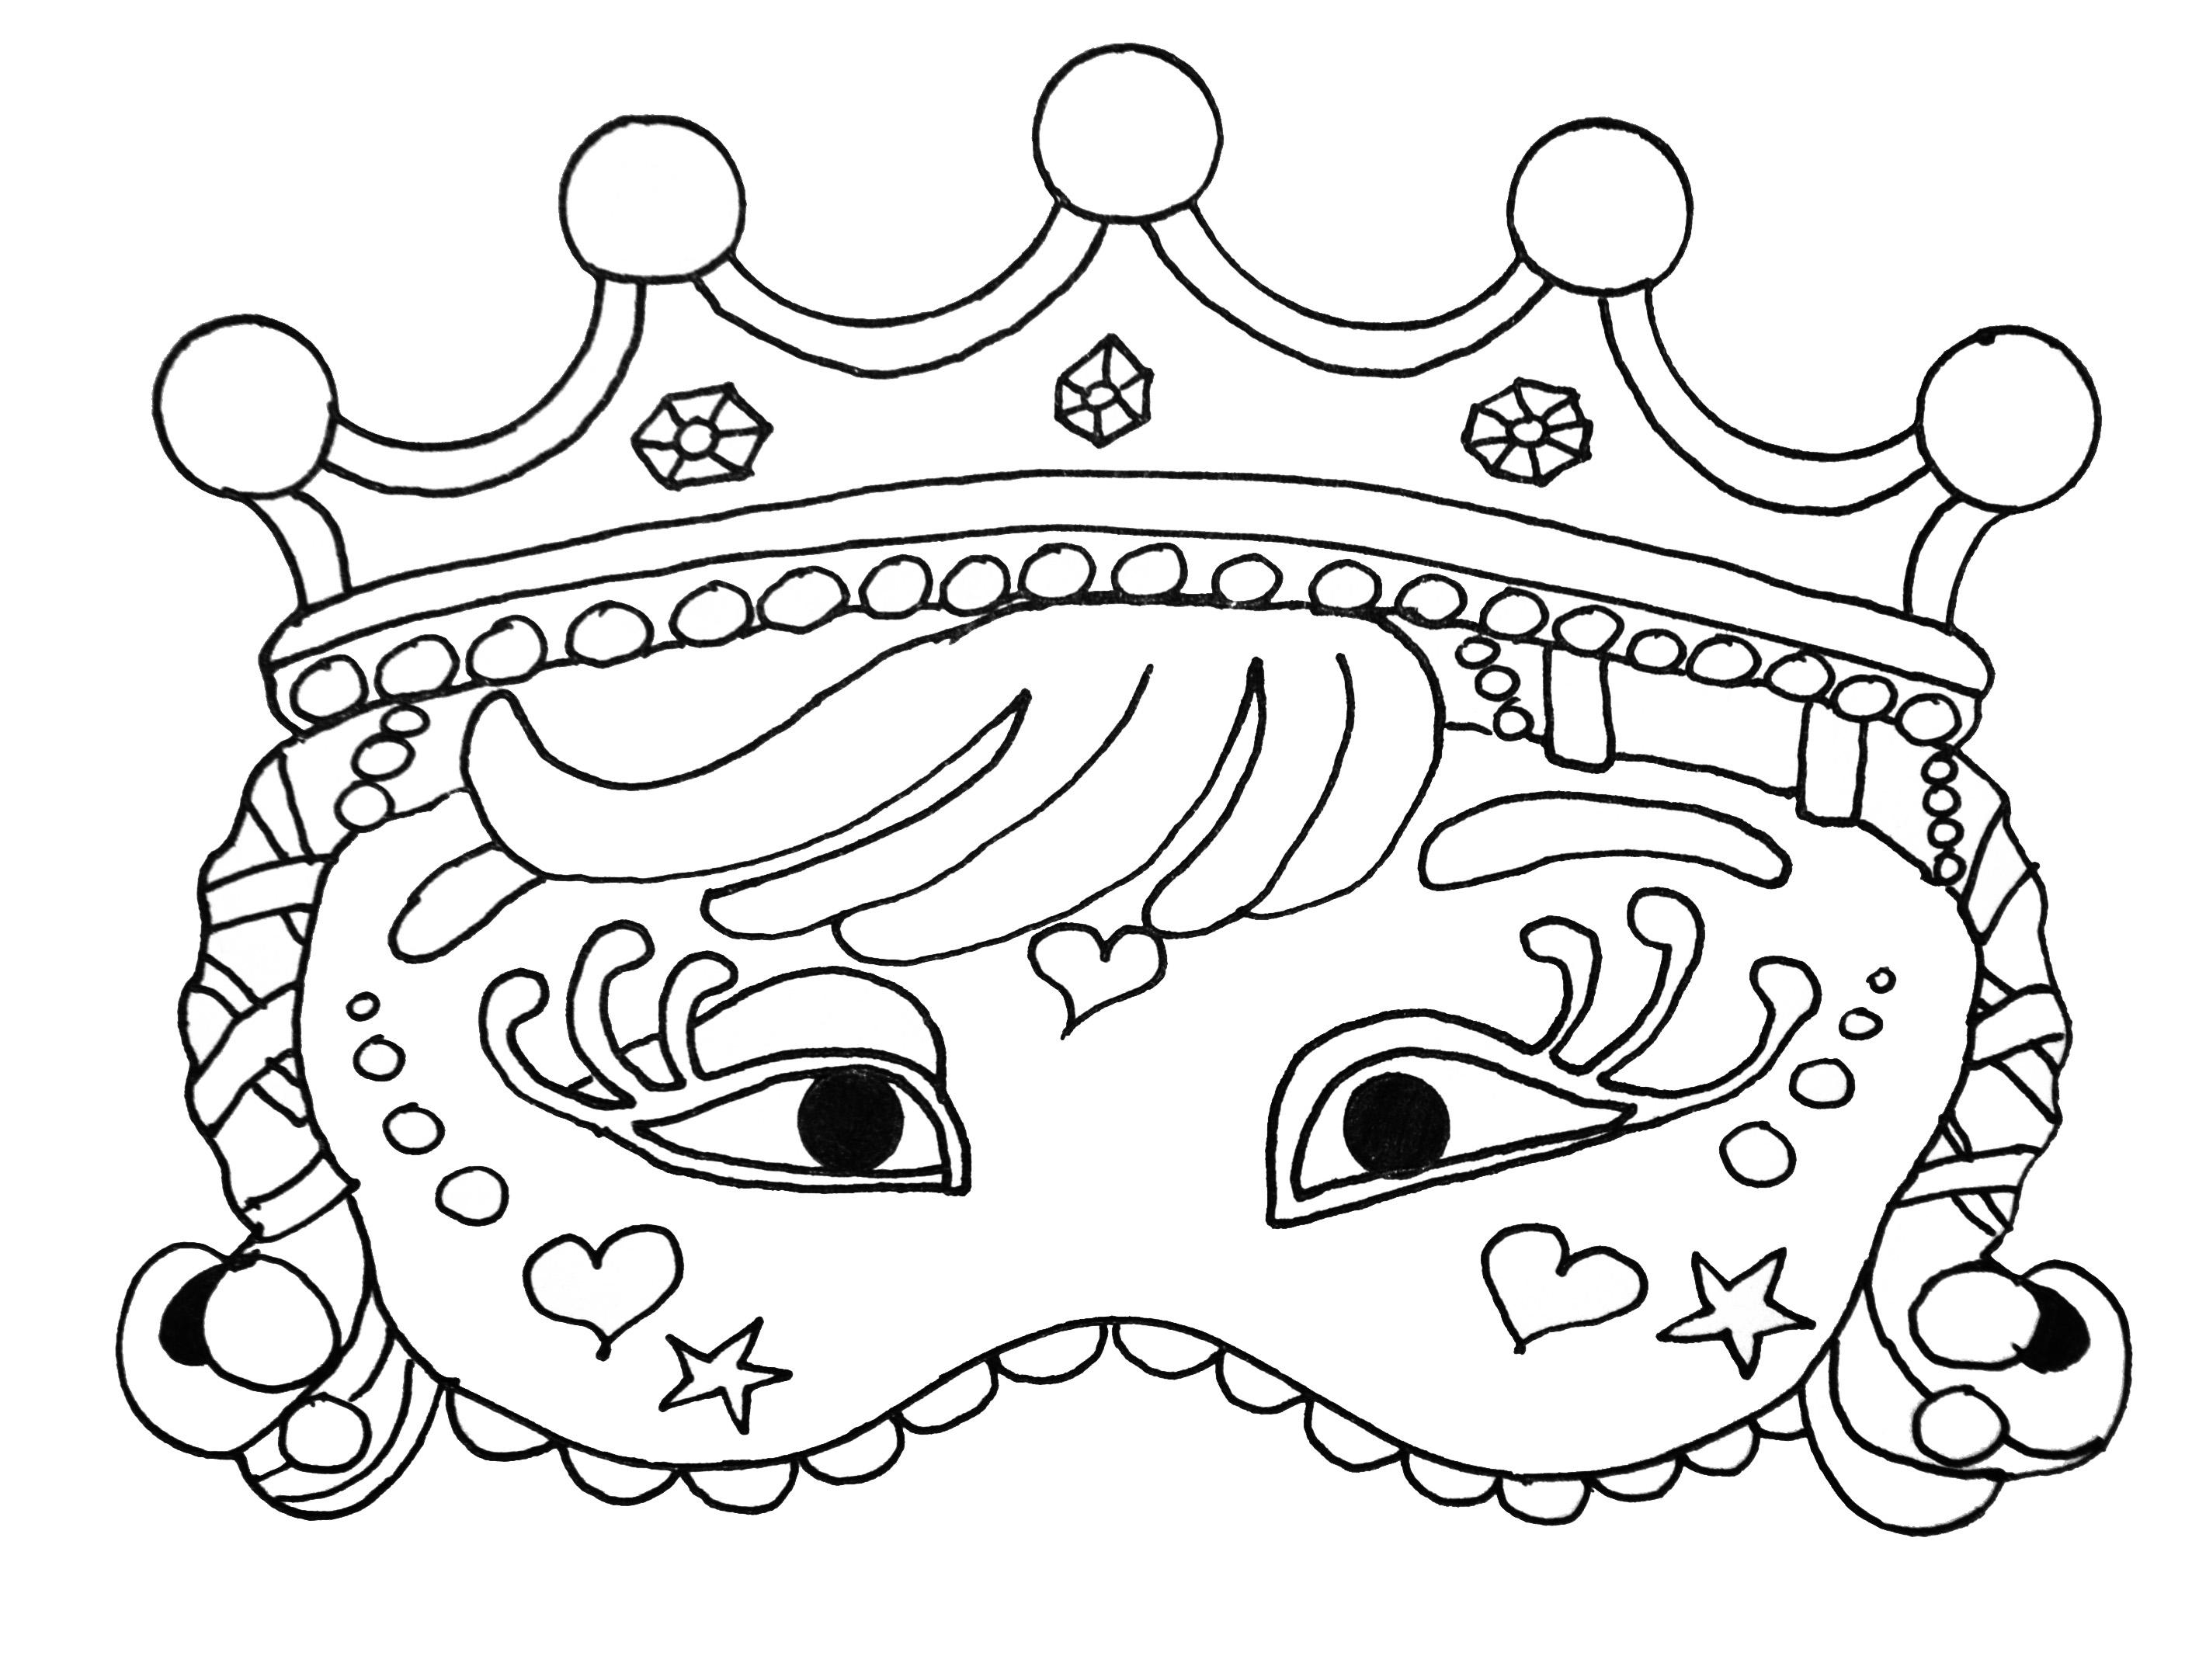 Enfants masque carnaval 2 coloriage de masques - Dessin de masque de carnaval ...